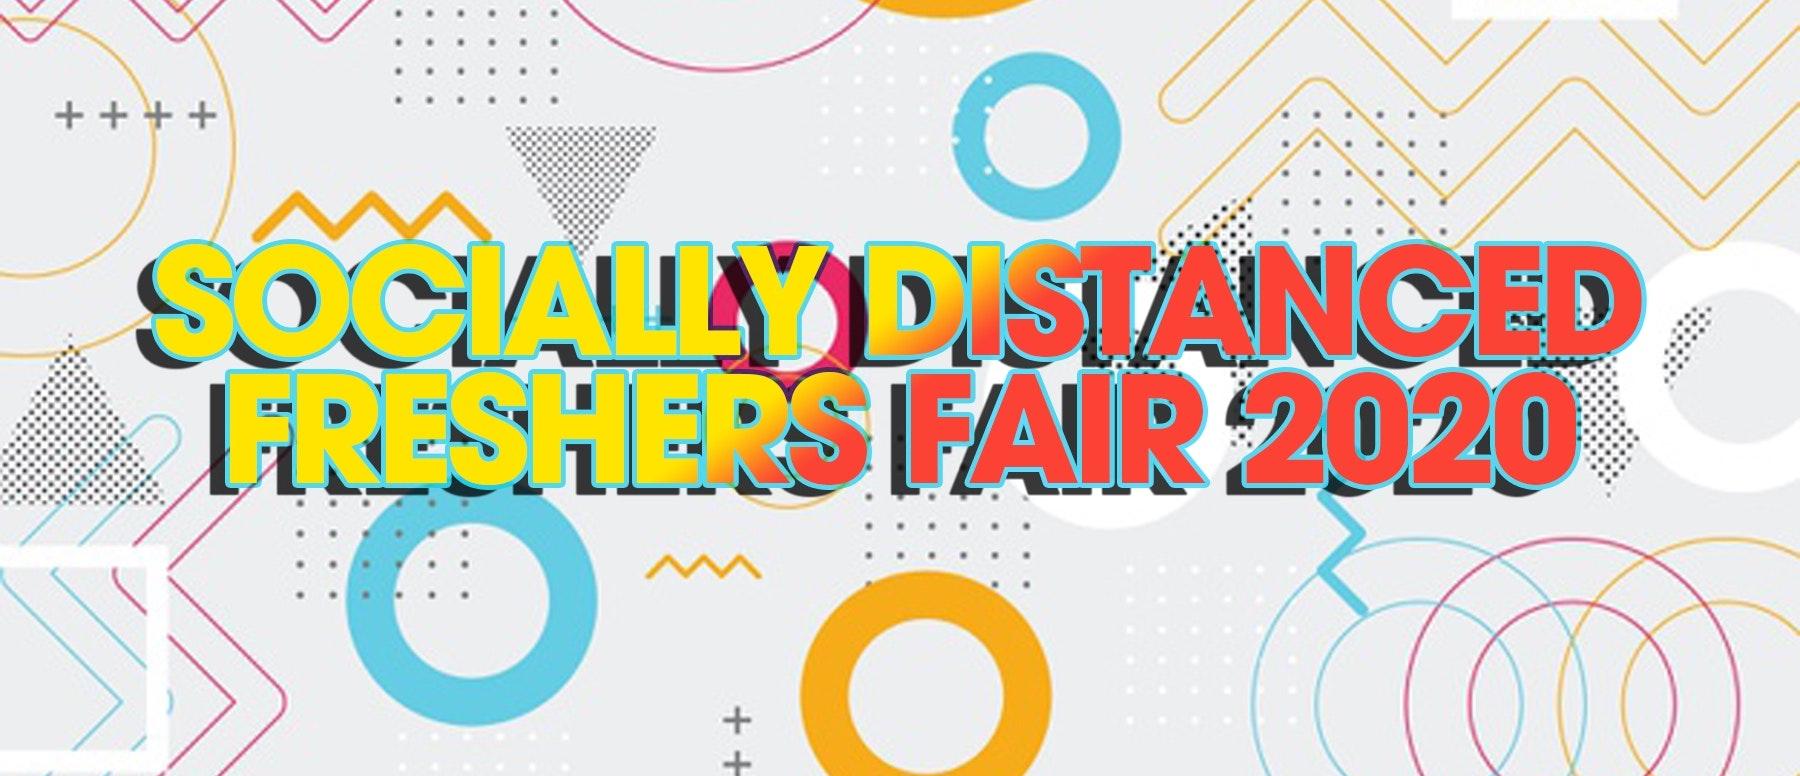 Socially Distanced RE-FRESHERS FAIR 2020! (100% Covid compliant)